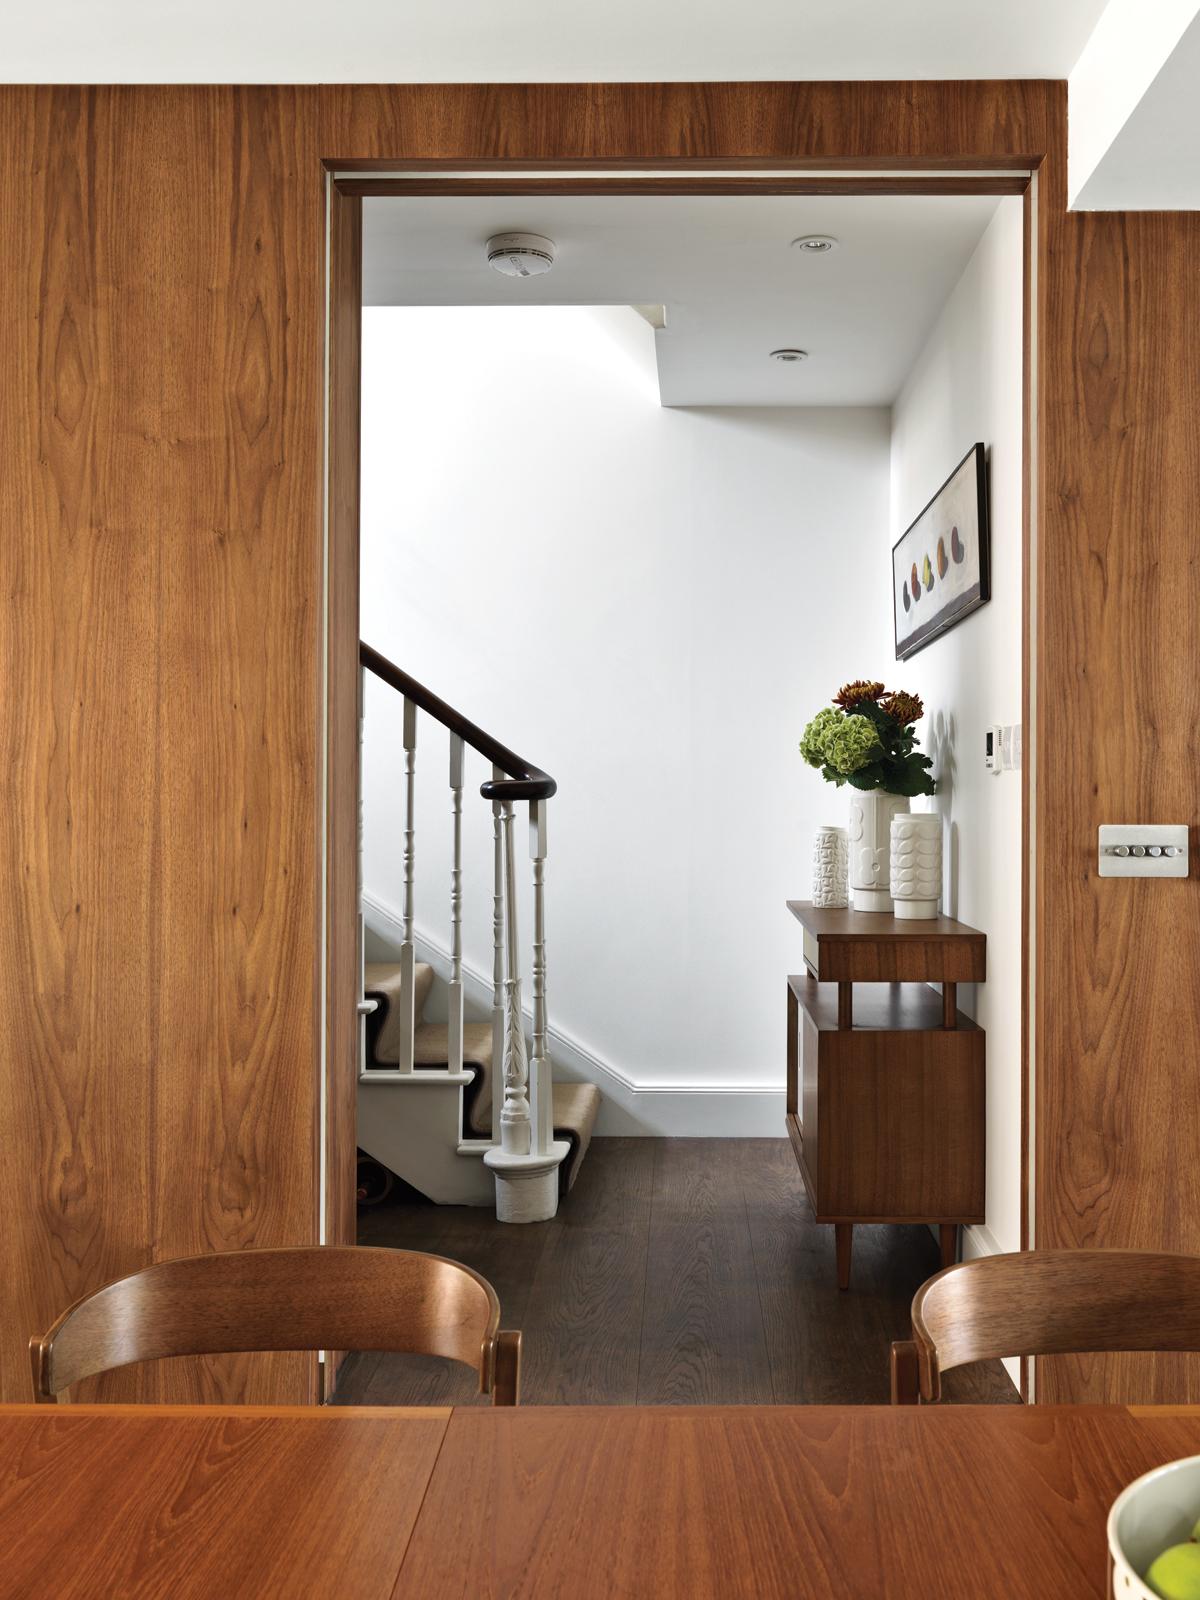 Textile designer Orla Kiely's home